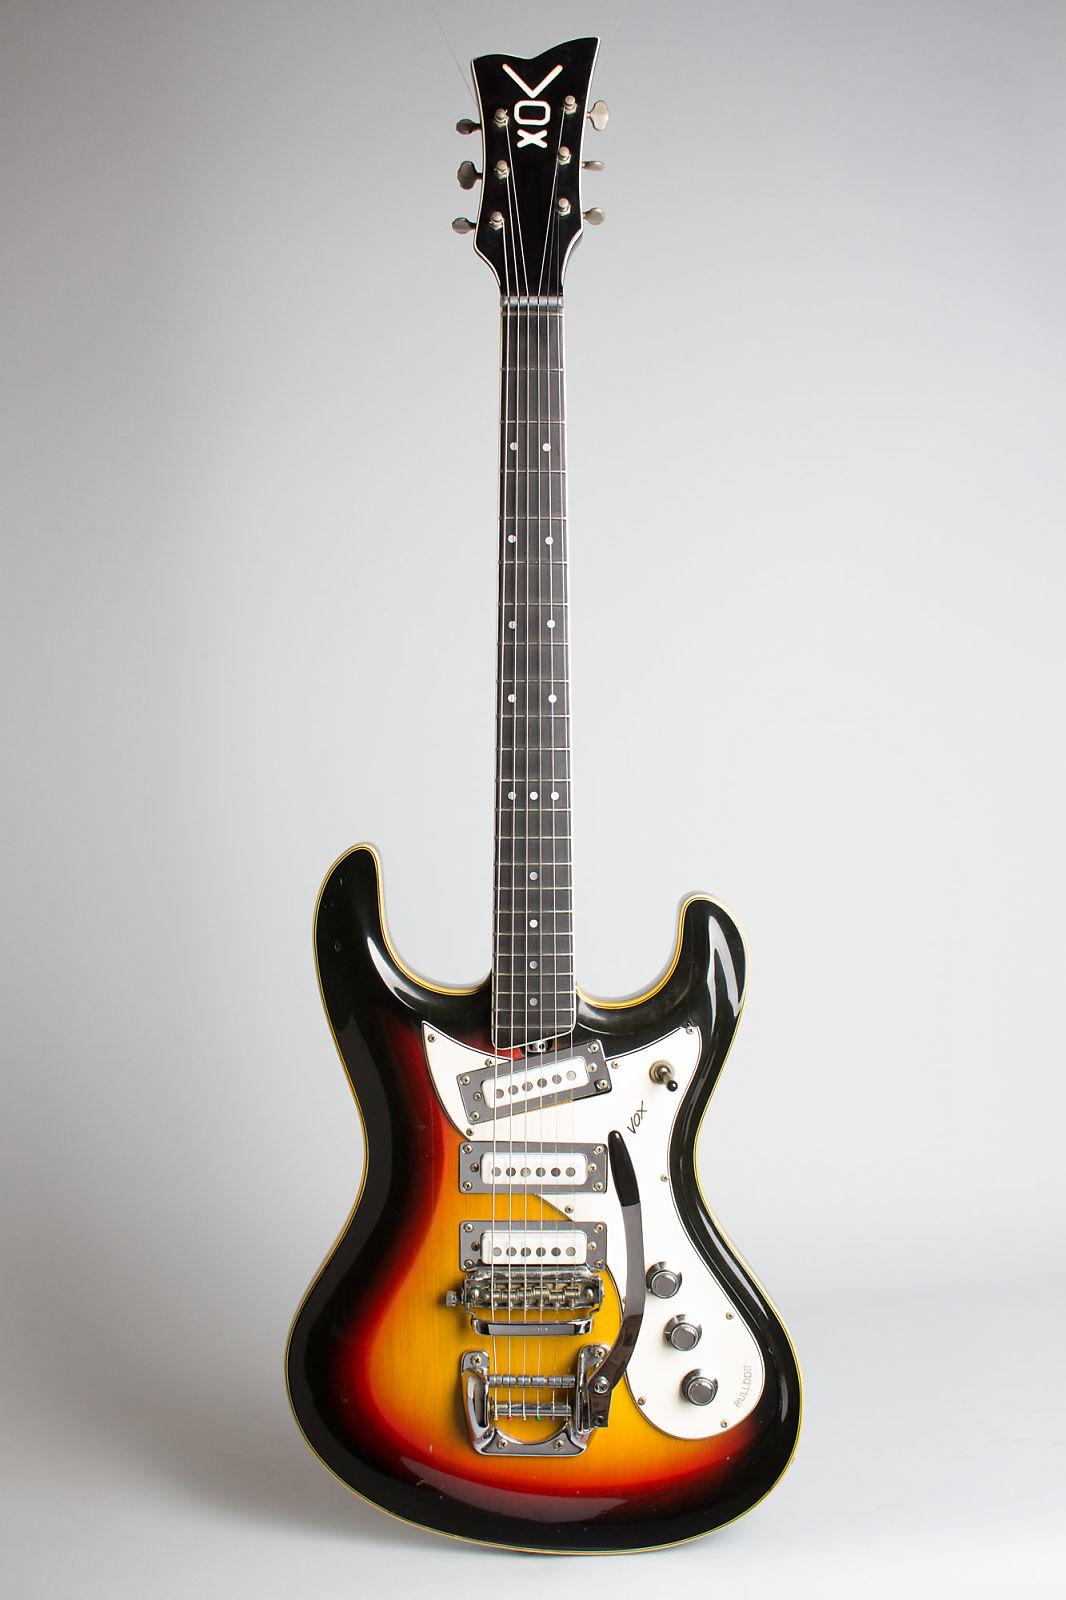 Vox  Bulldog Solid Body Electric Guitar (1966), ser. #267087, black gig bag case.